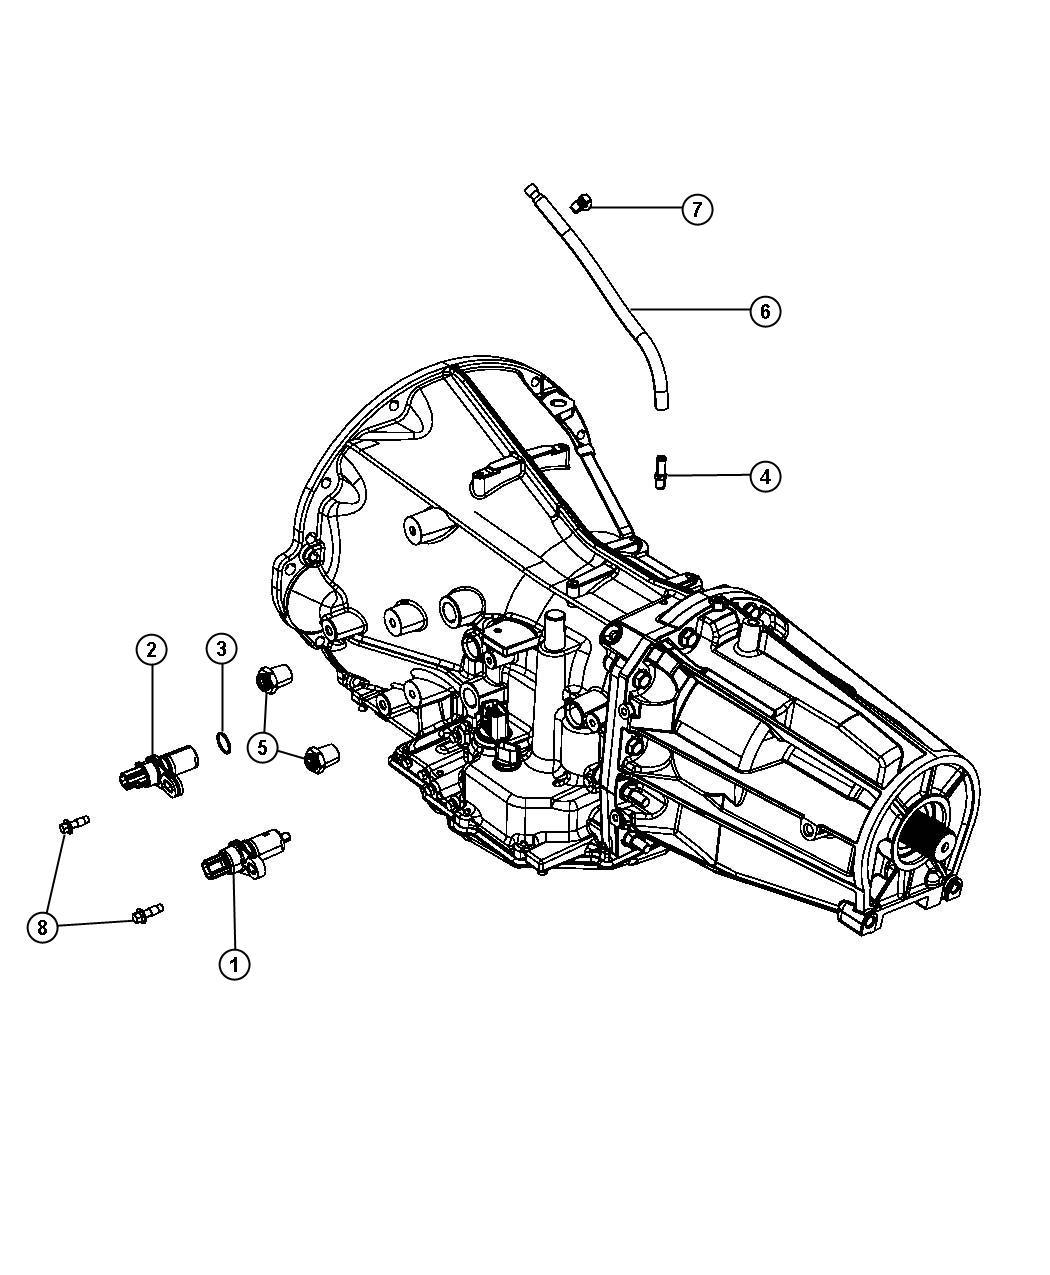 2008 Chrysler 300 Sensors, Vents And Quick Connectors